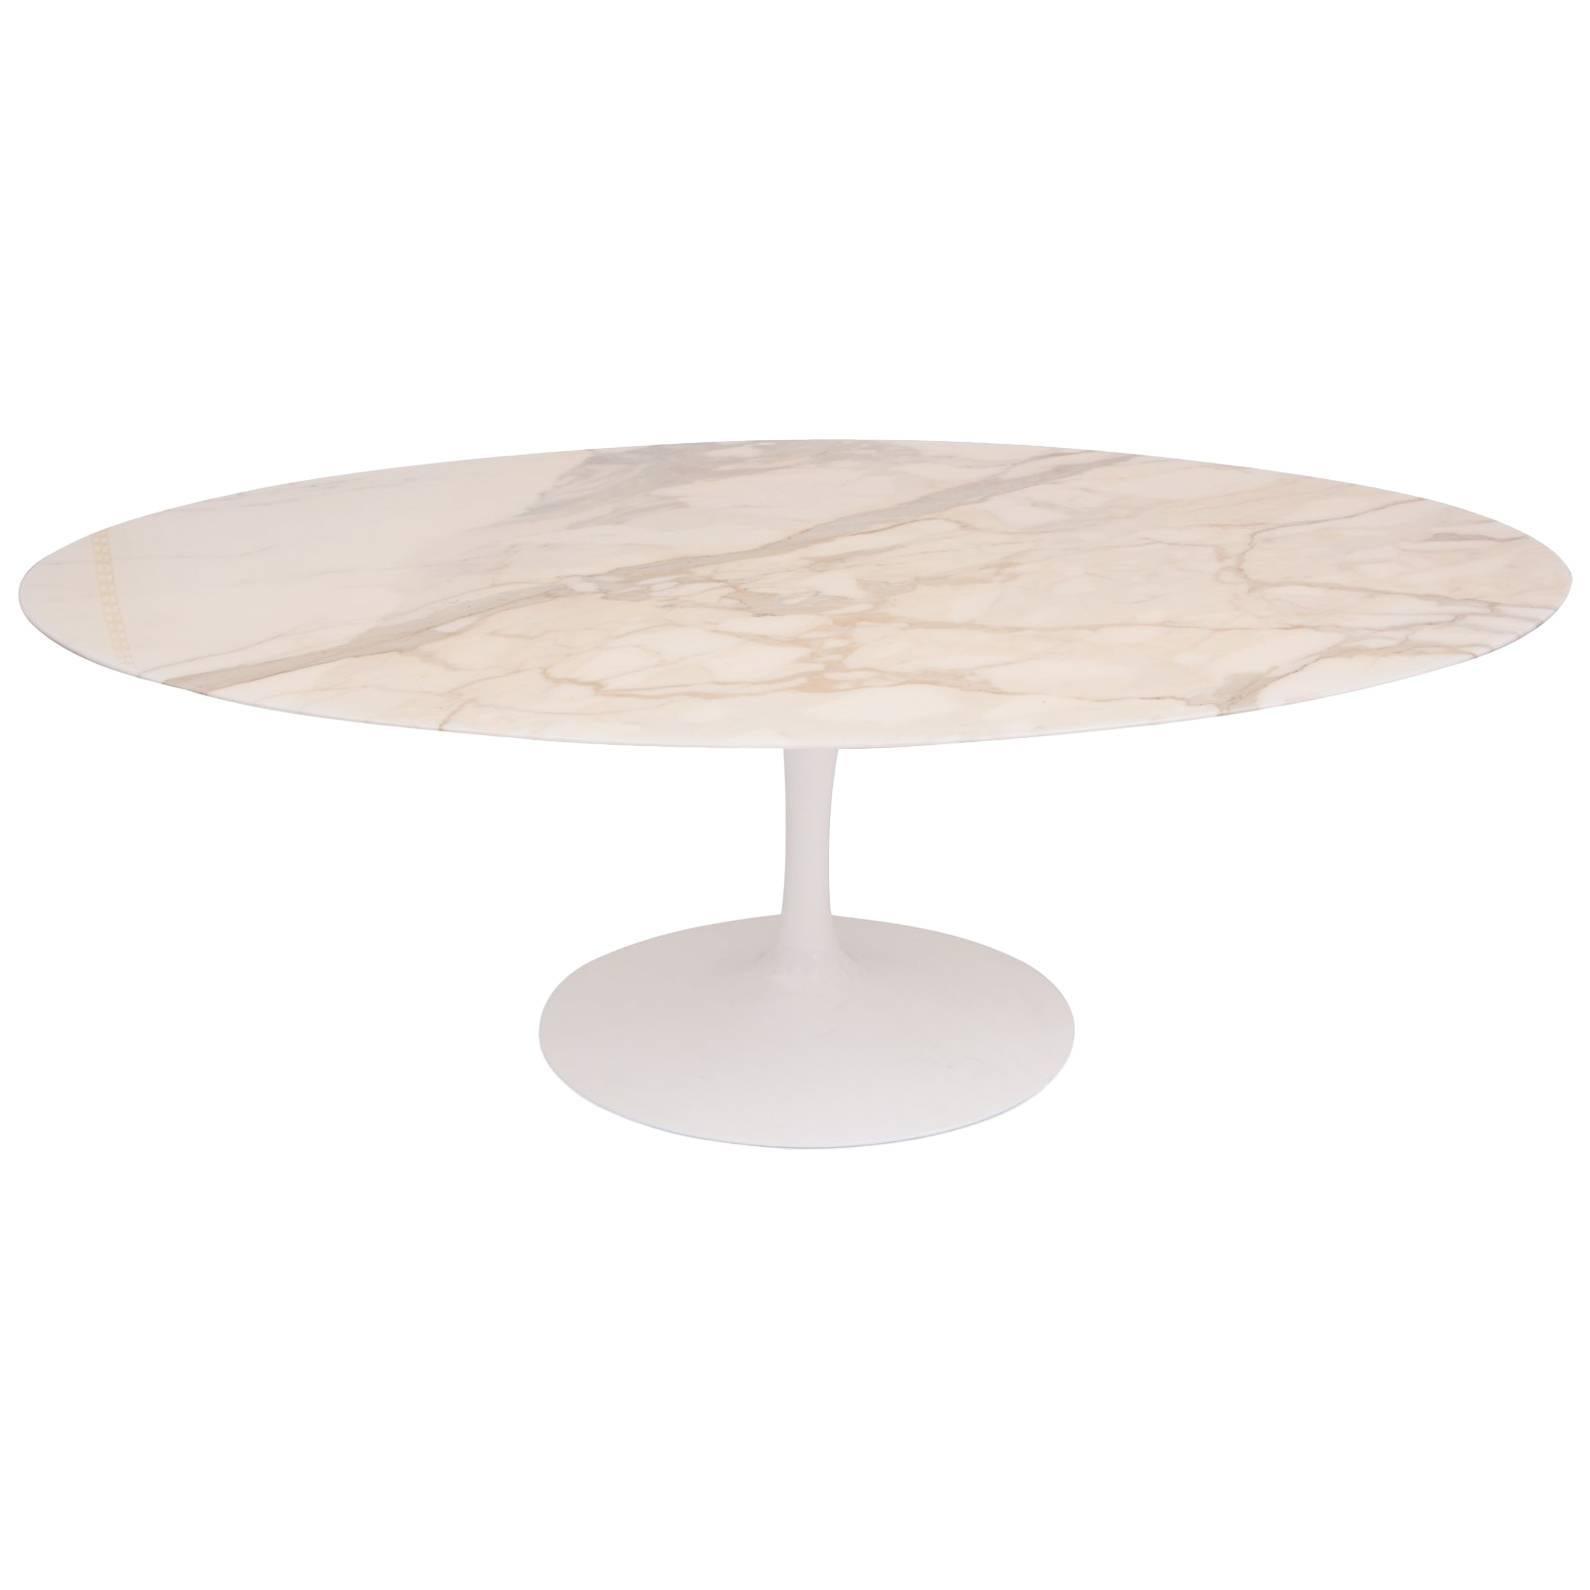 Eero Saarinen Knoll Calacatta Marble Oval Dining Table For Sale